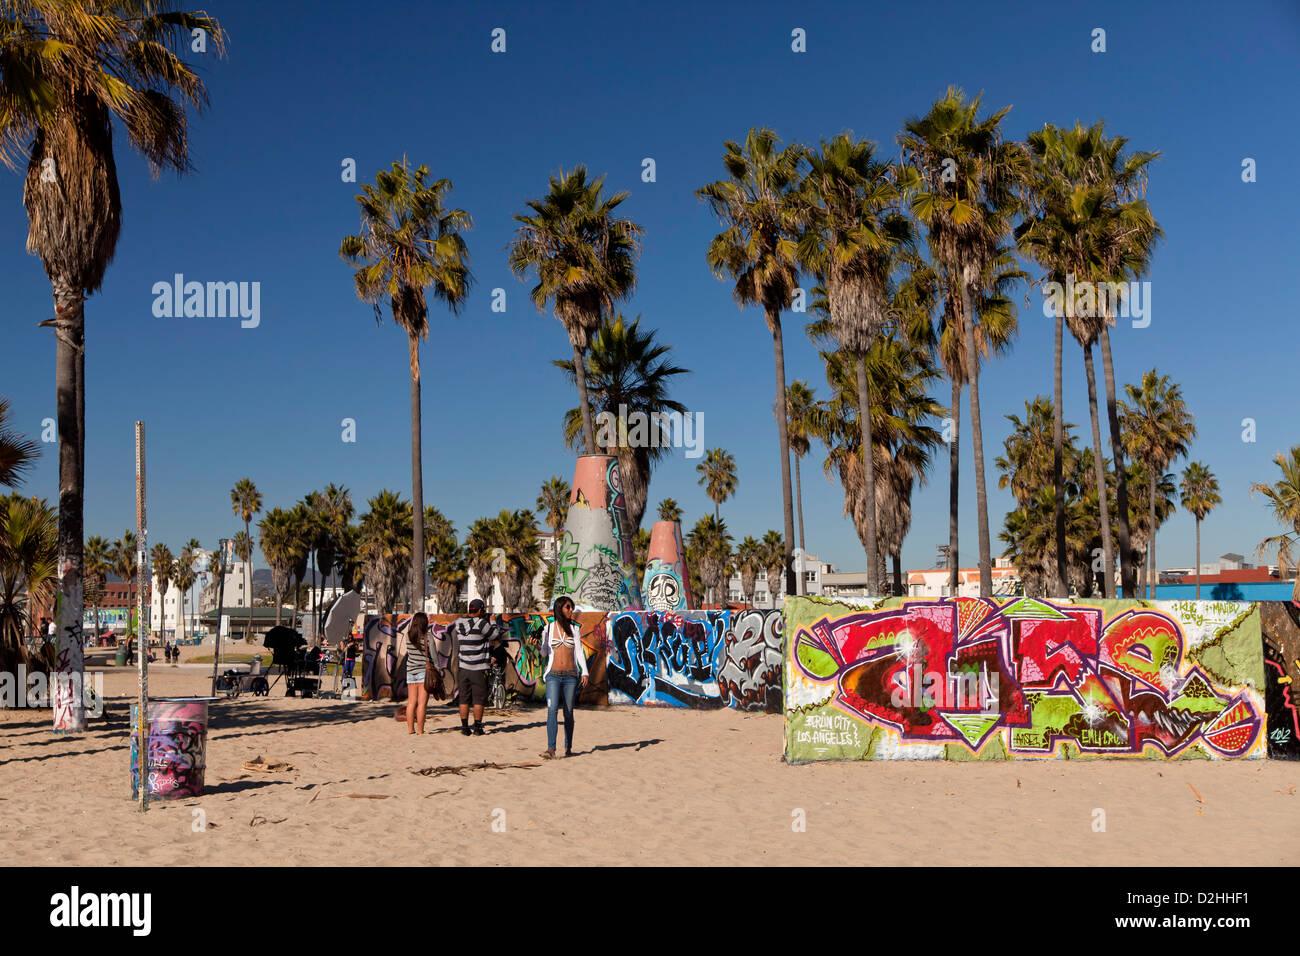 Graffitti at Venice Beach, Los Angeles, California, United States of America, USA - Stock Image